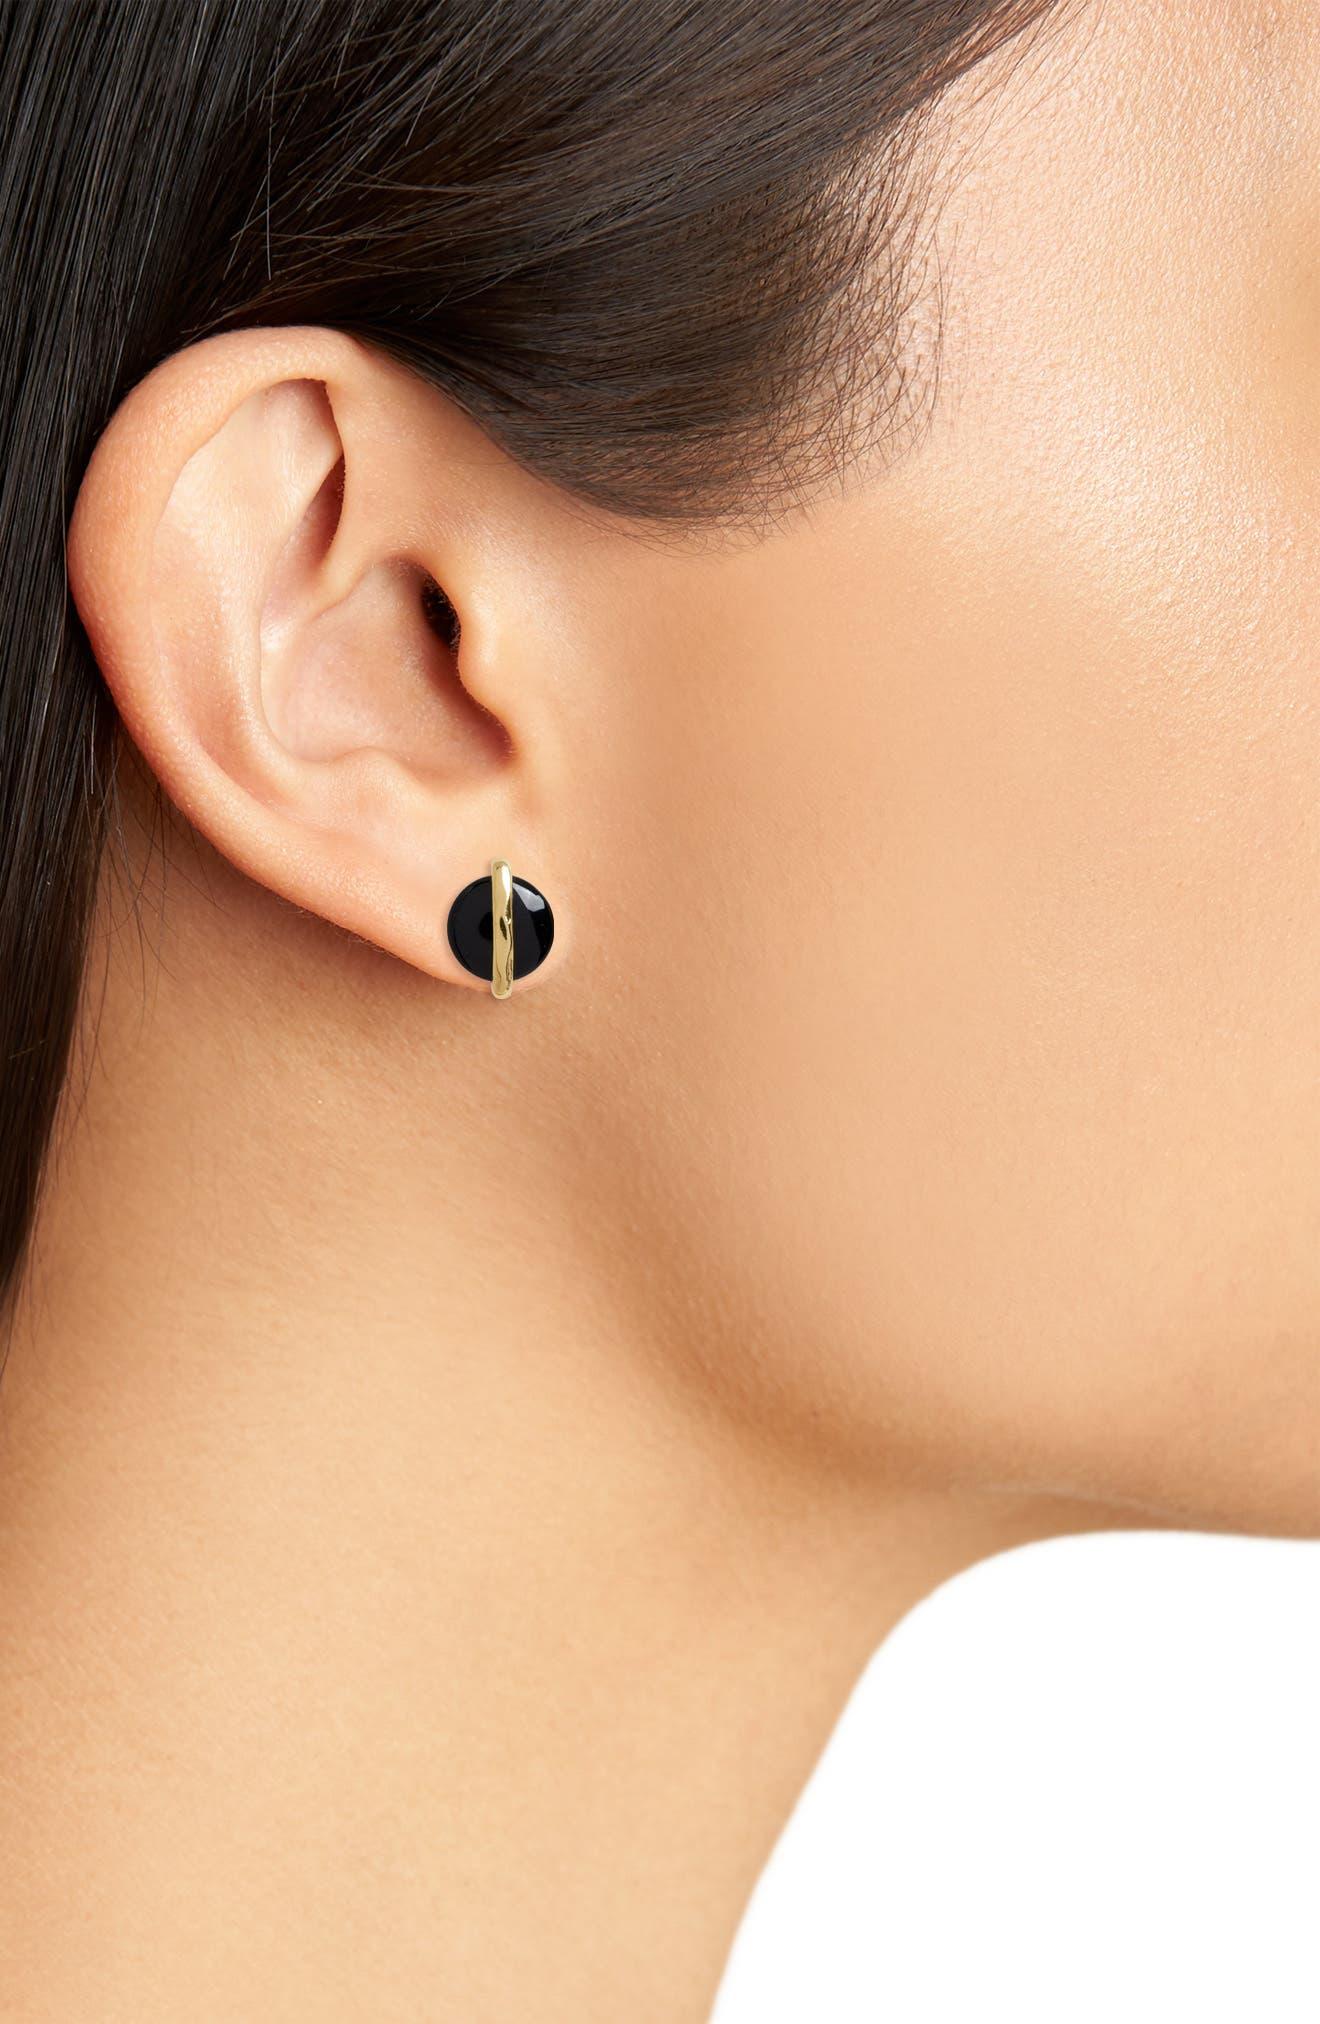 Brinn Stud Earrings,                             Alternate thumbnail 2, color,                             BLACK ONYX